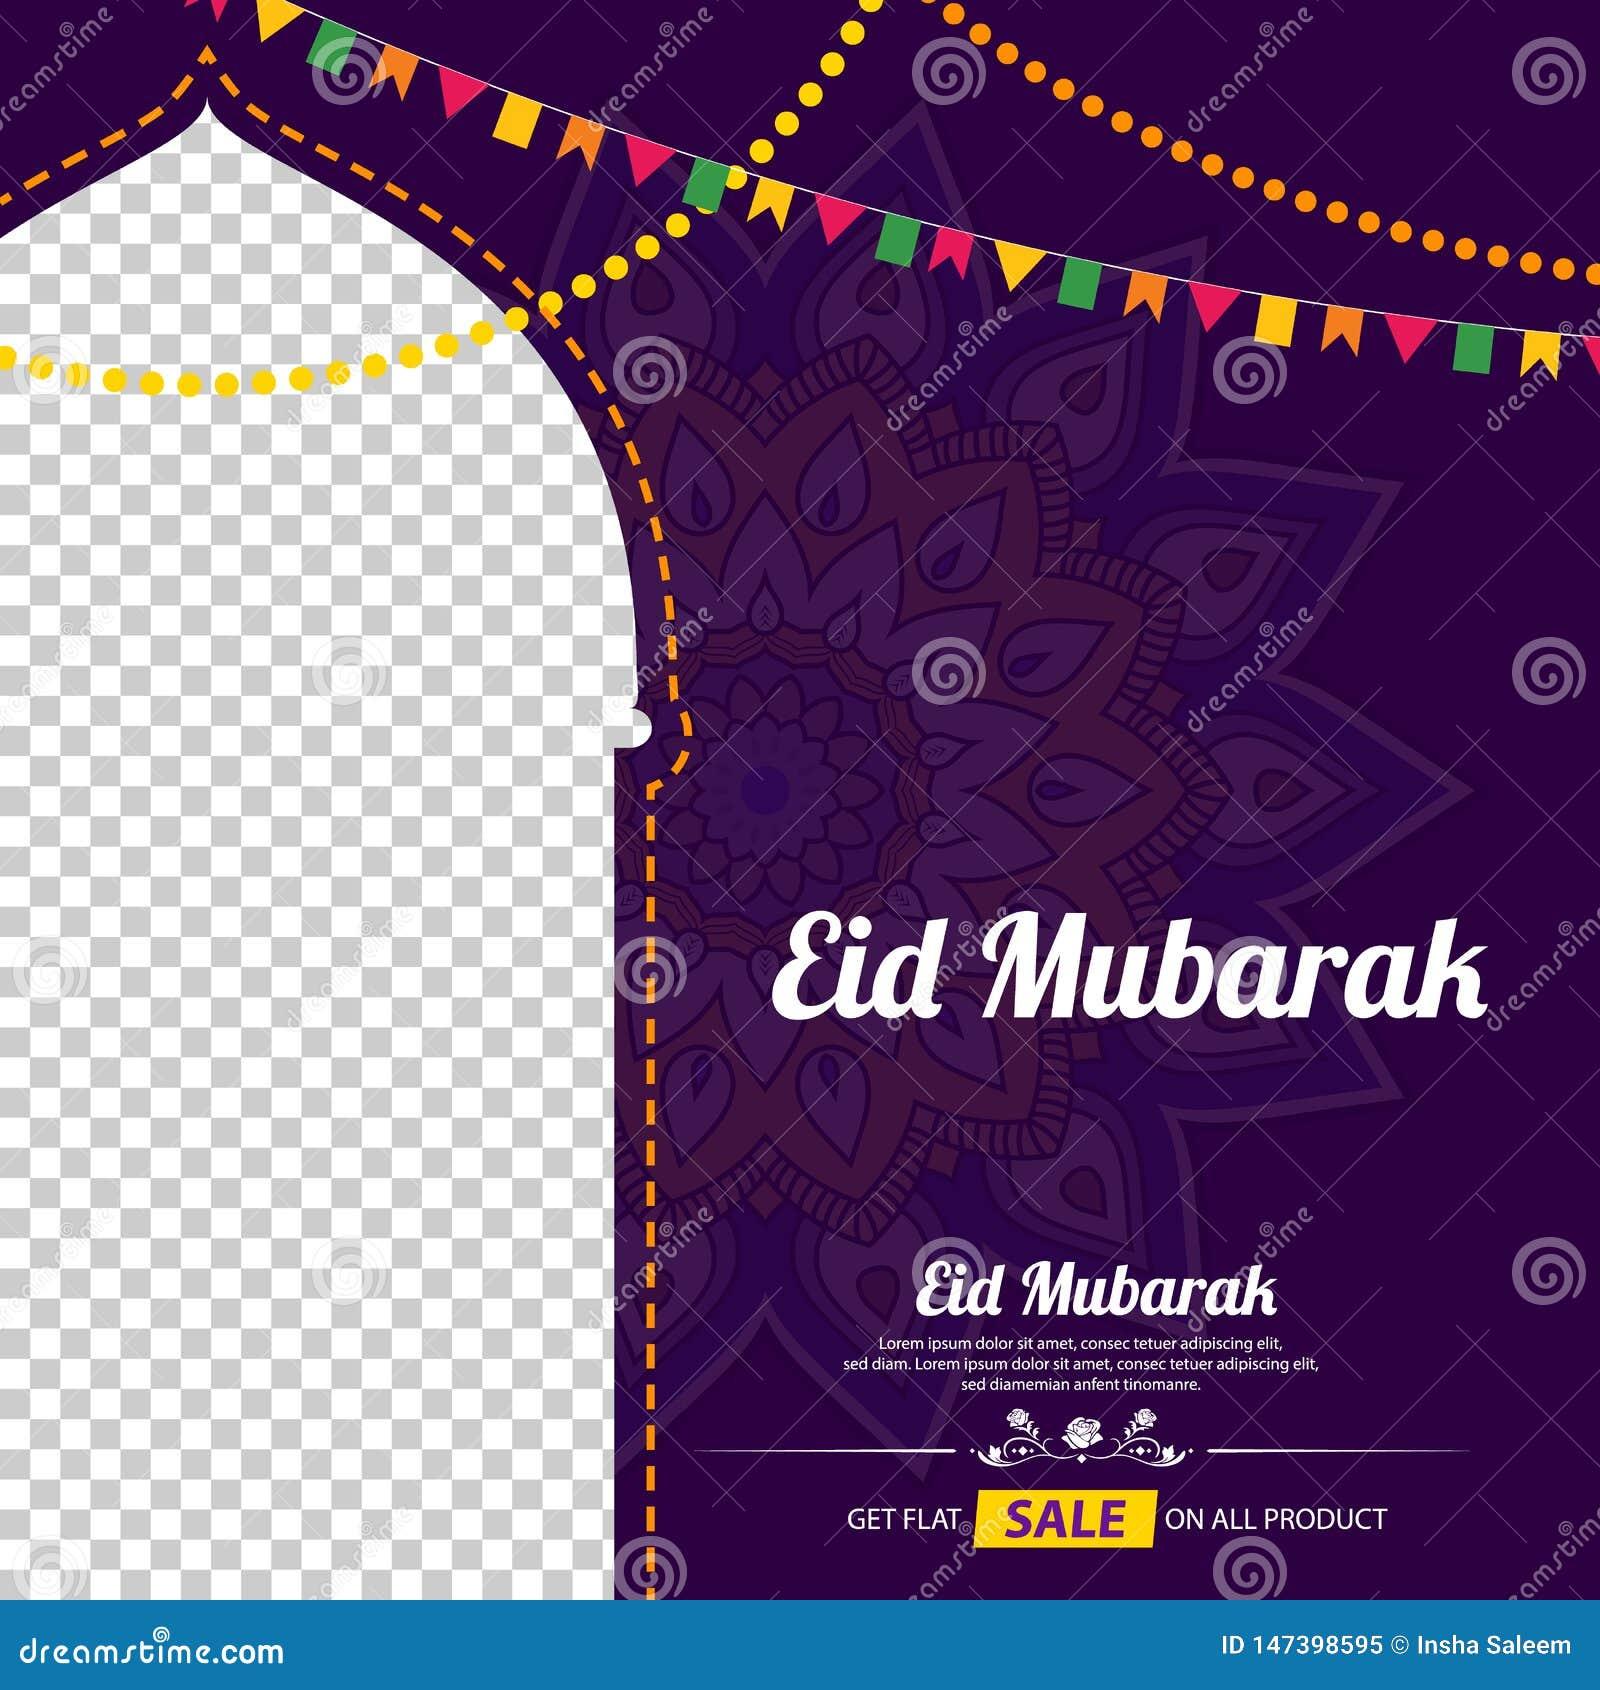 Eid穆巴拉克节日问候传染媒介